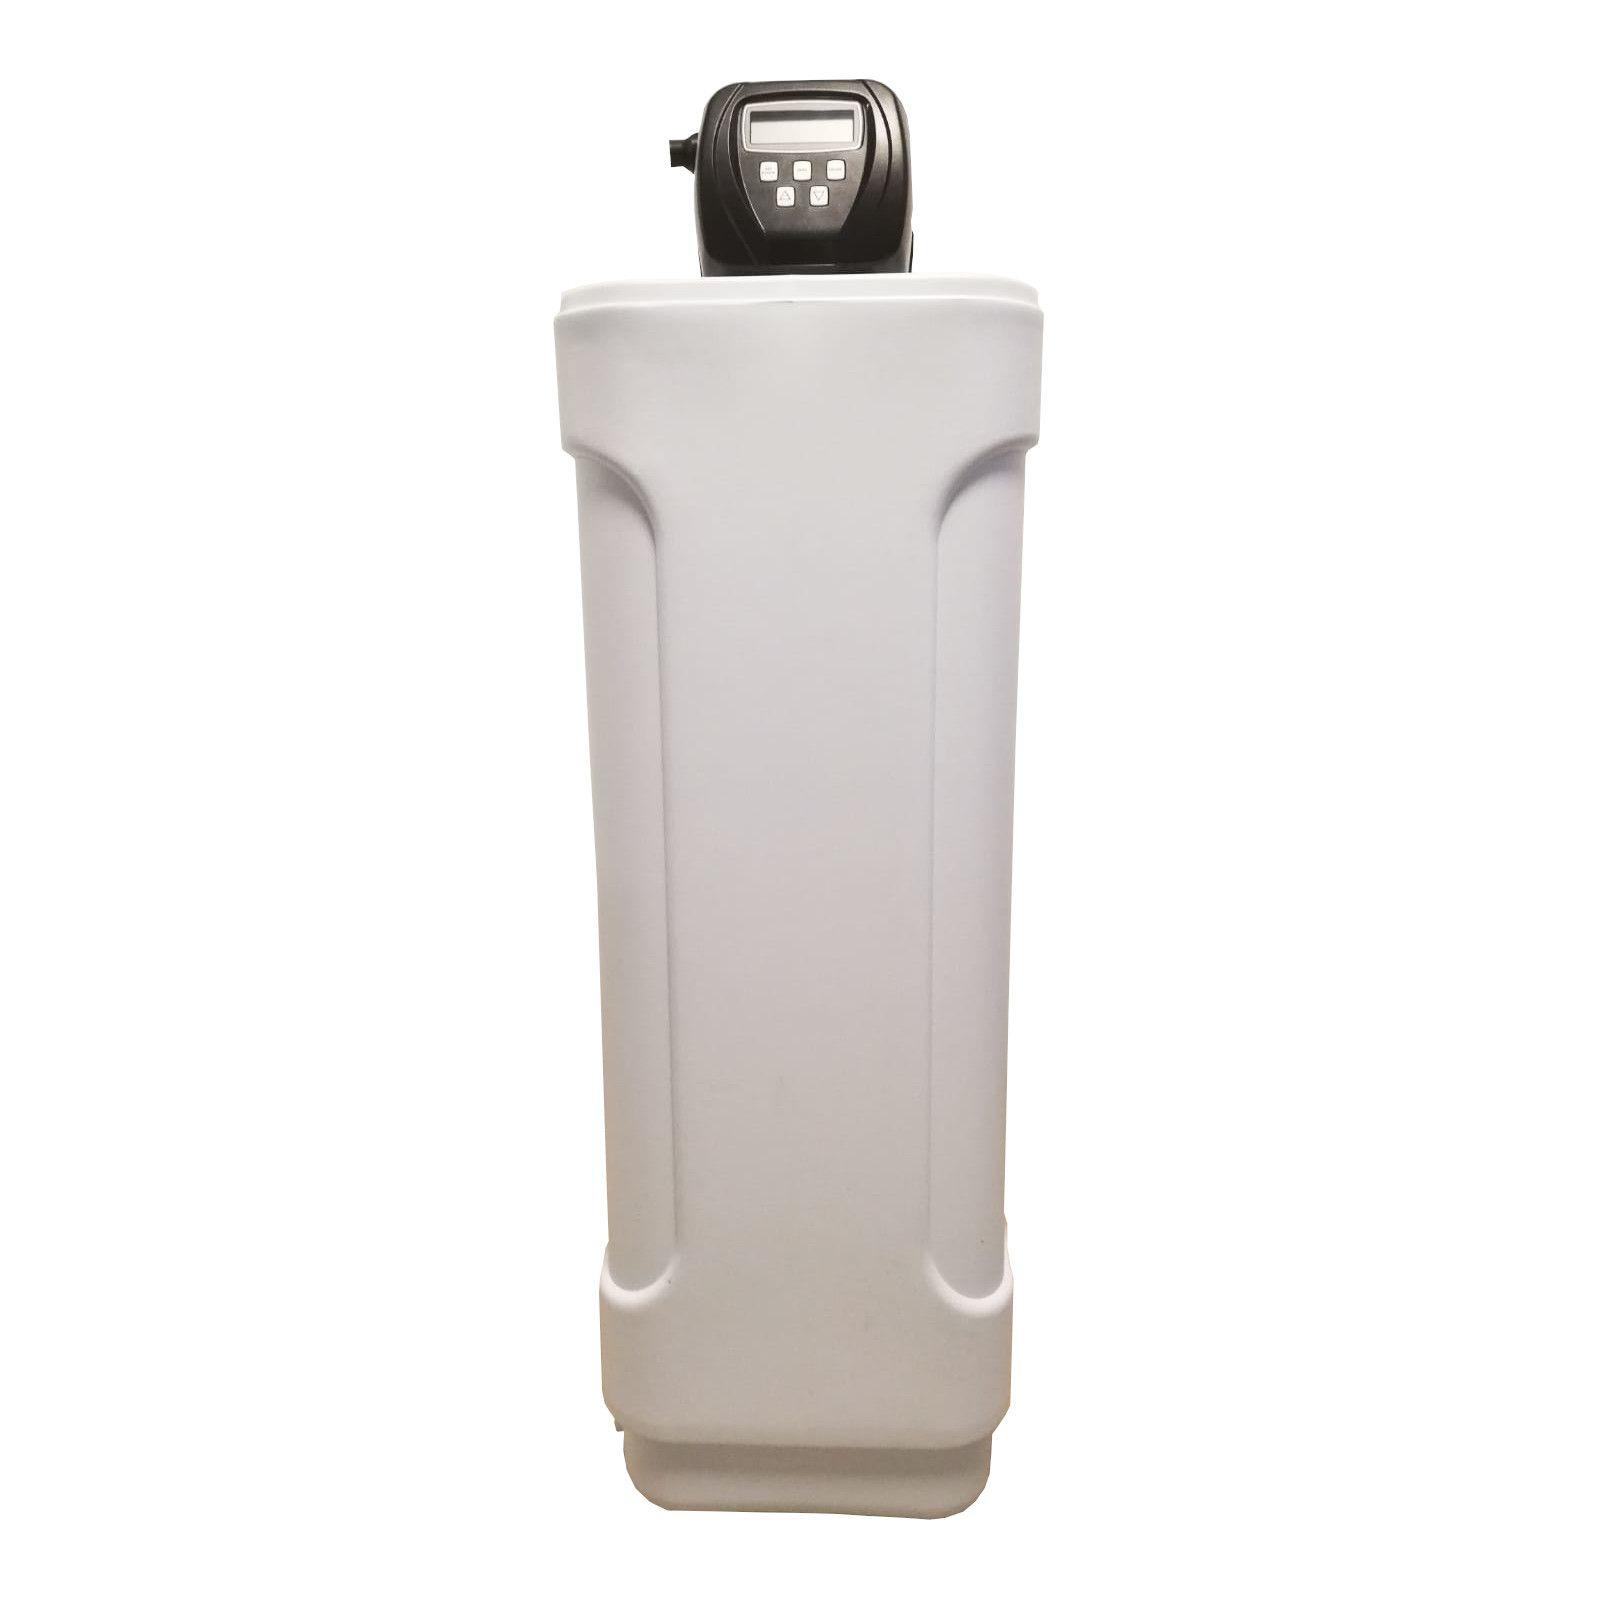 Dedurizator Compact Aqua Maxy 30-Clack SUA-CI, Debit 1.8 mc/h, Capacitate filtrare 60.000 litri, Cartus din Rasina Cationica - AquaFilters.ro